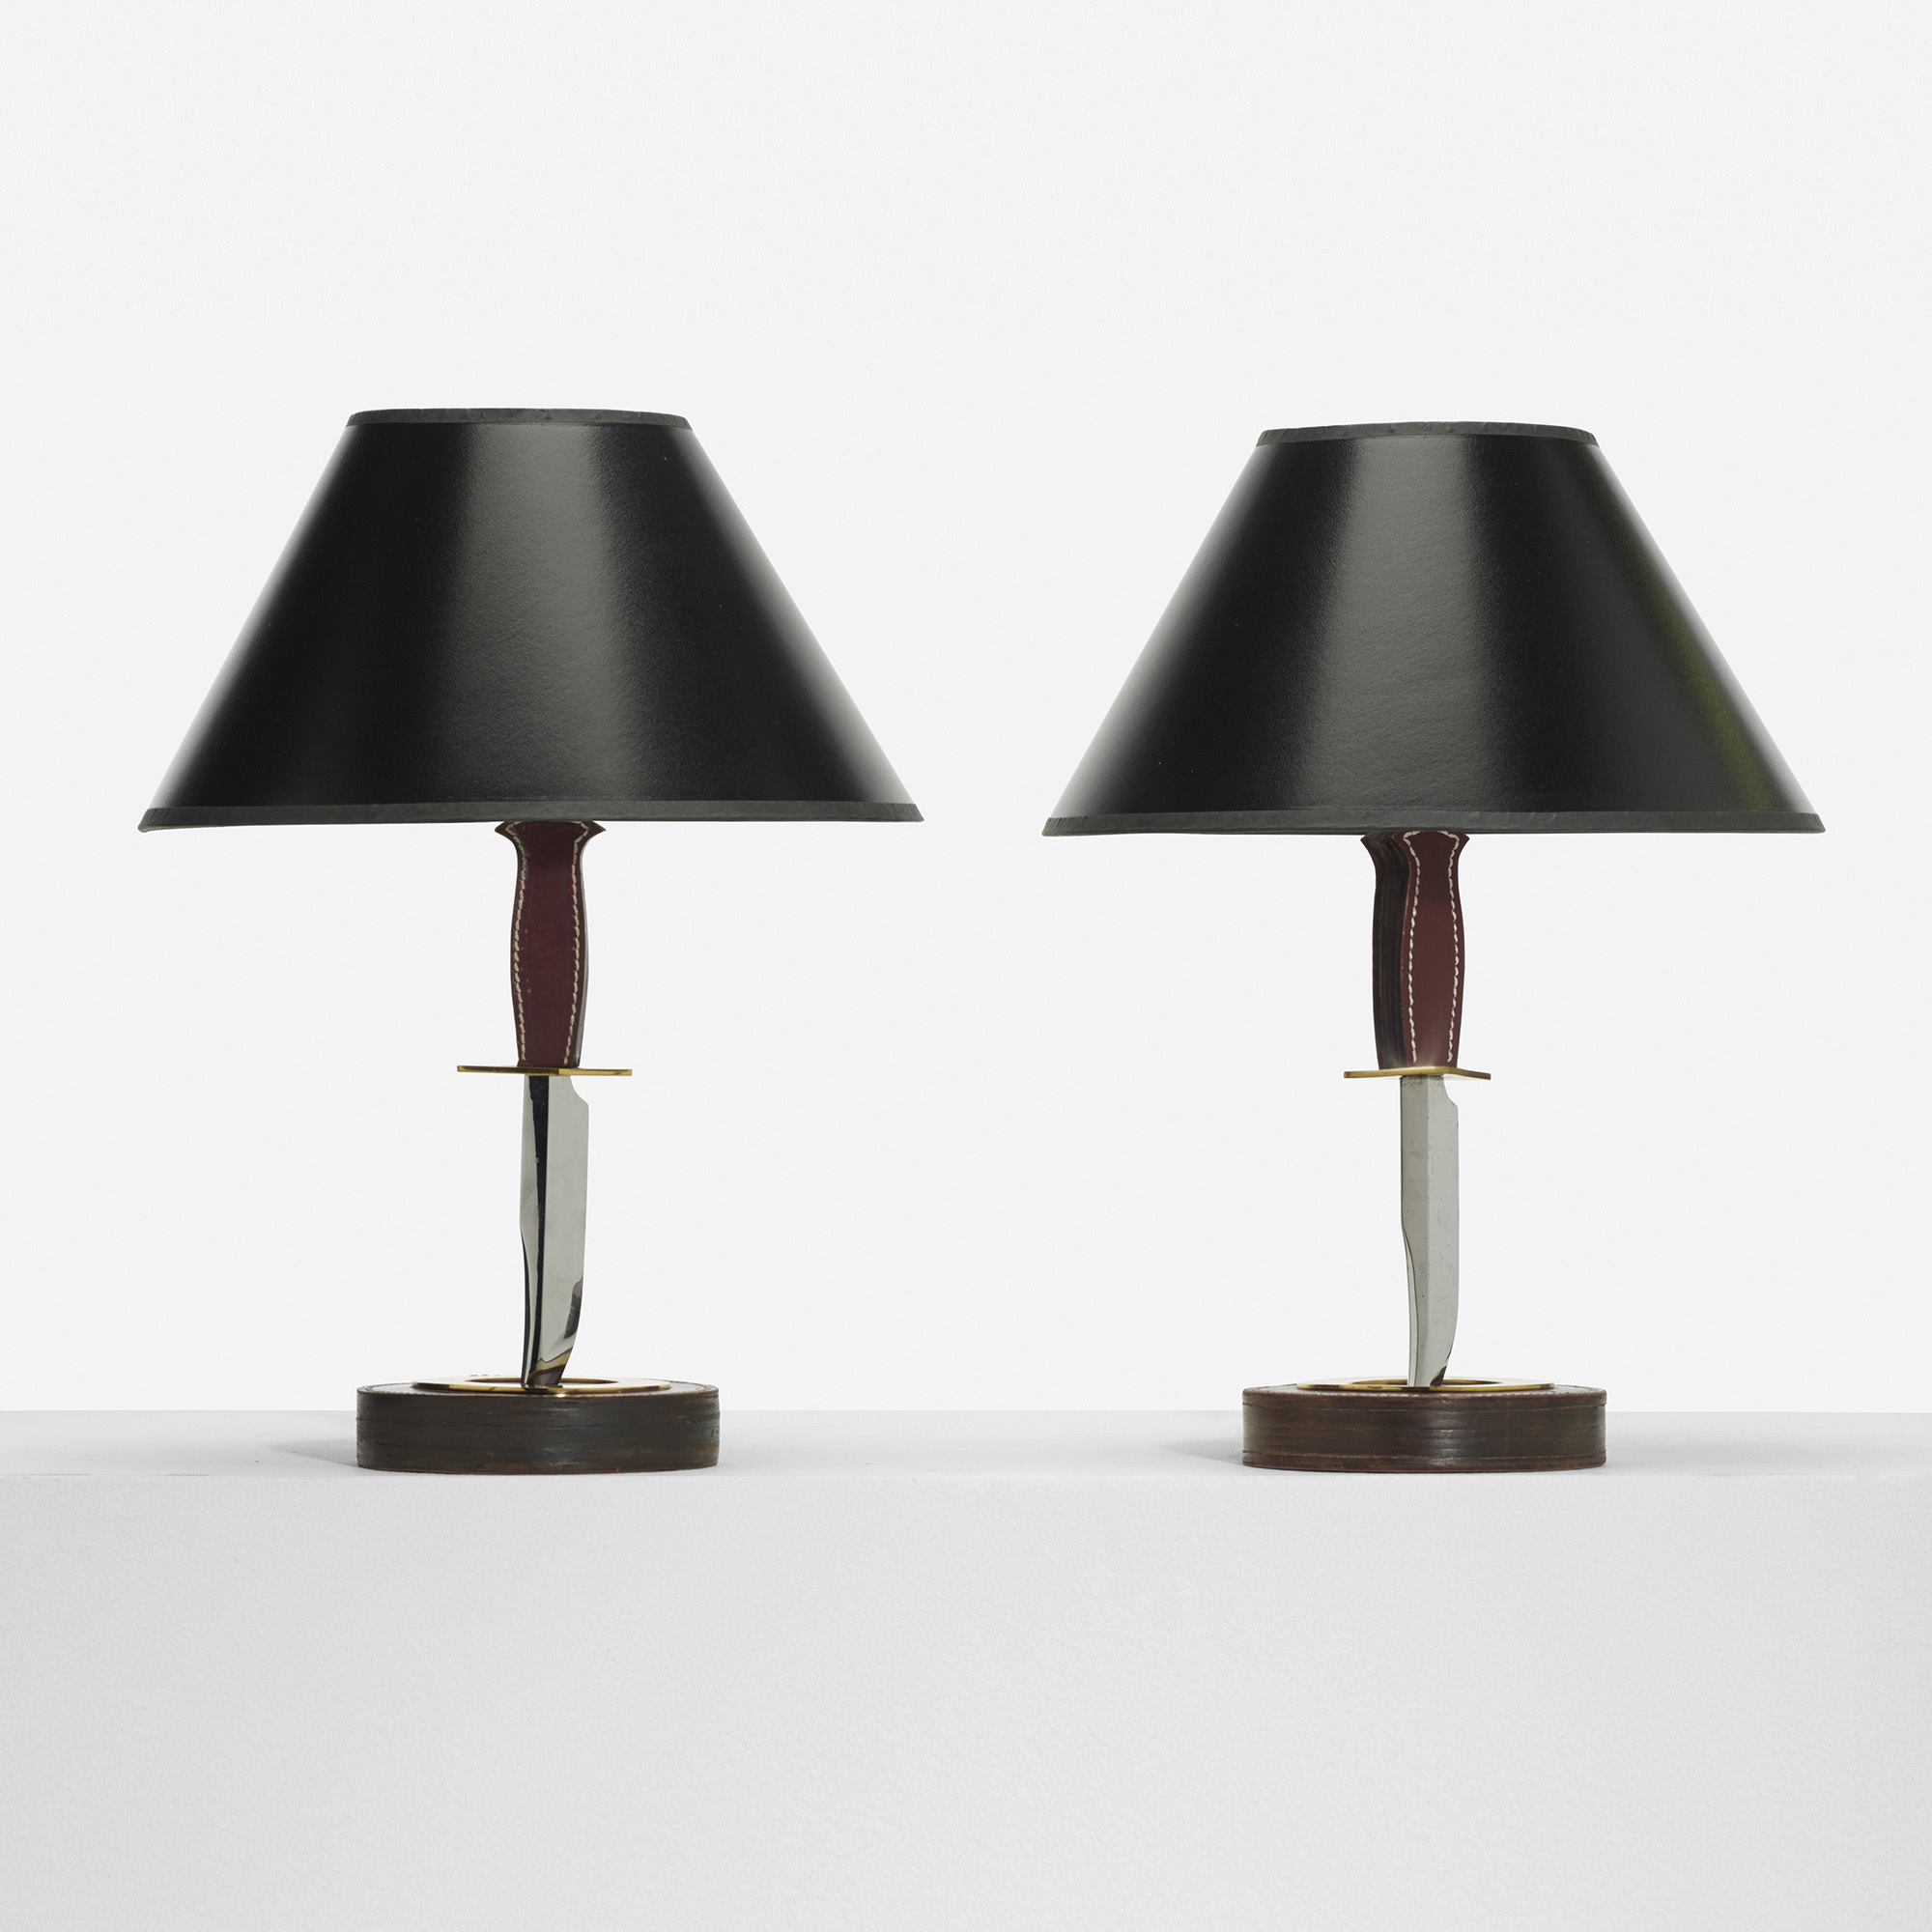 Stupendous 286 Hermes Table Lamps Pair Design 12 December 2013 Home Interior And Landscaping Mentranervesignezvosmurscom